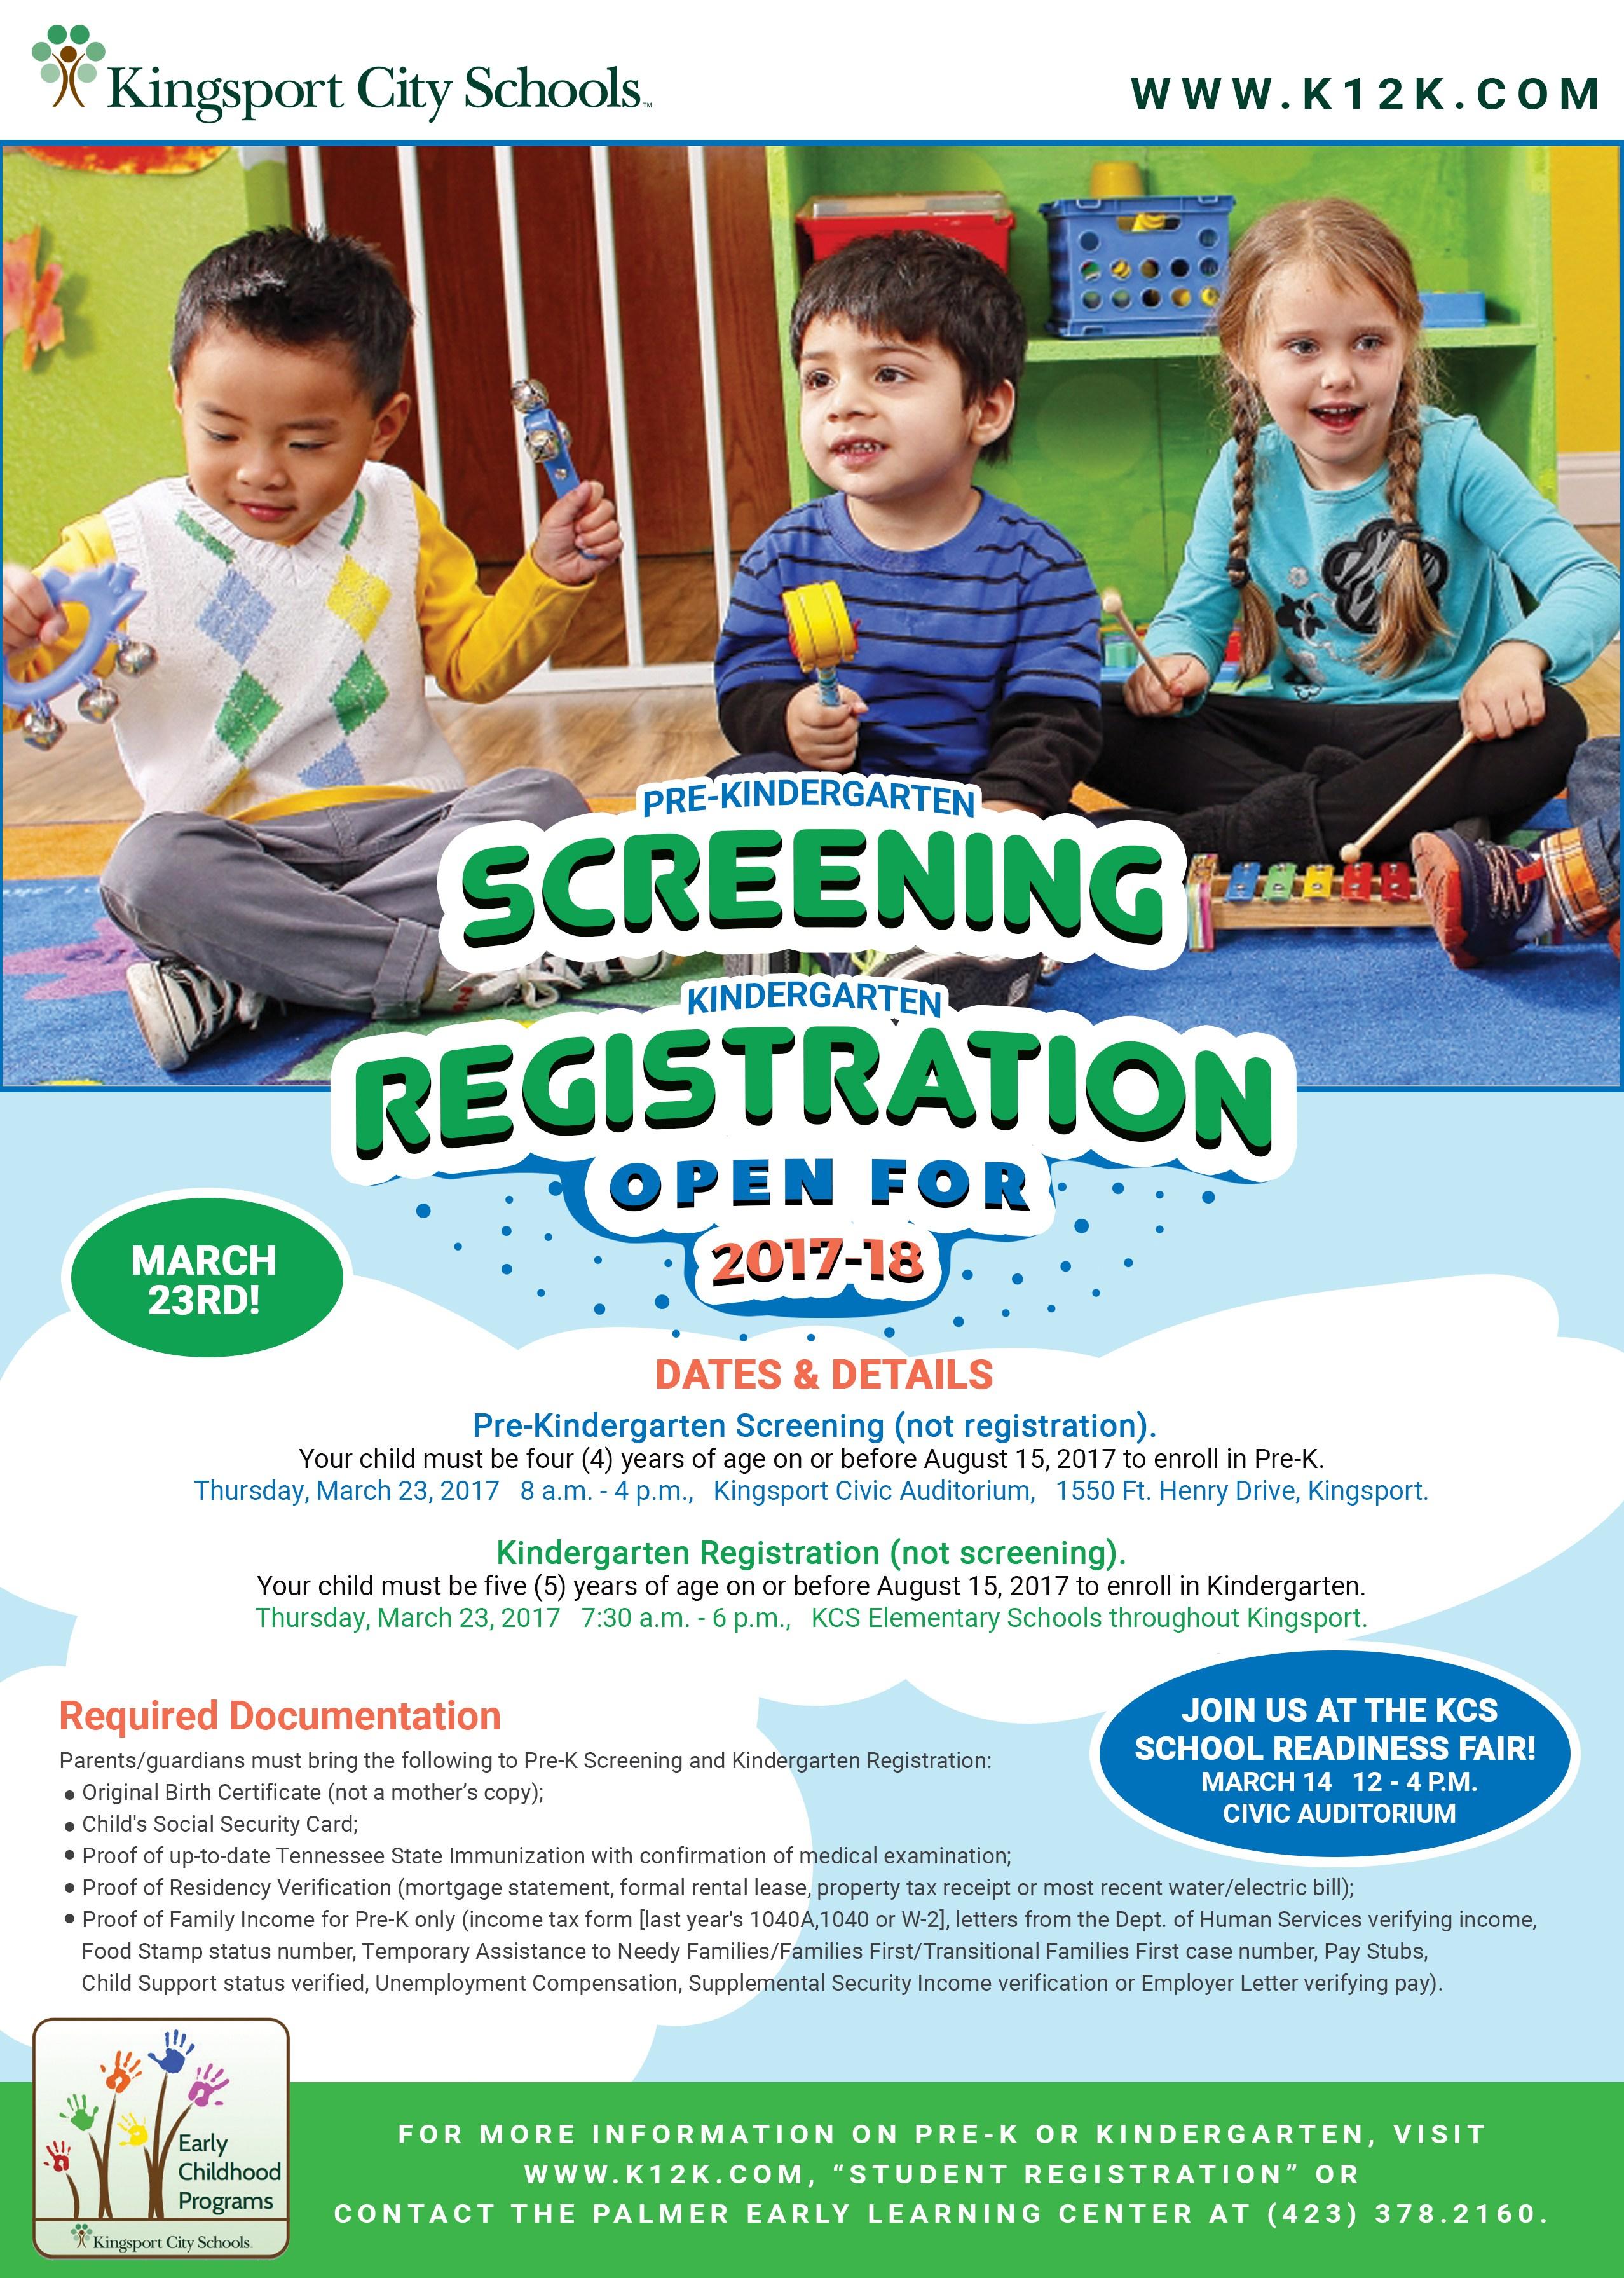 Pre-K Screening flyer